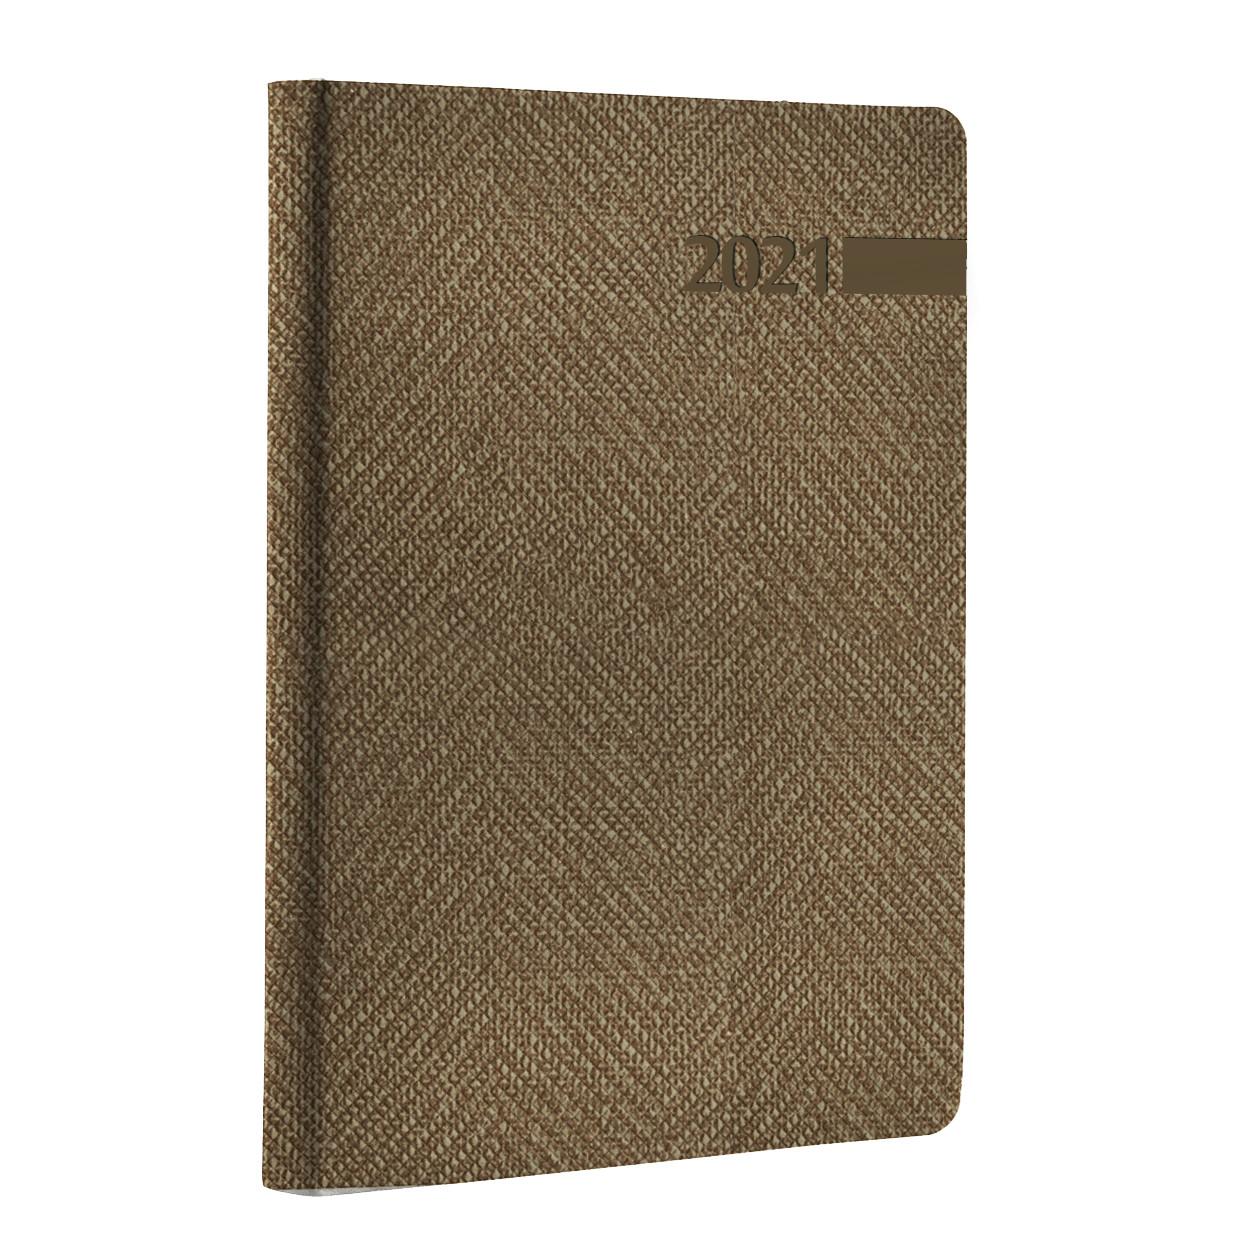 "Ежедневник А5 дат. Leo Planner ""Boss"", 2021, мягк., 352+2 стр., бежевый"